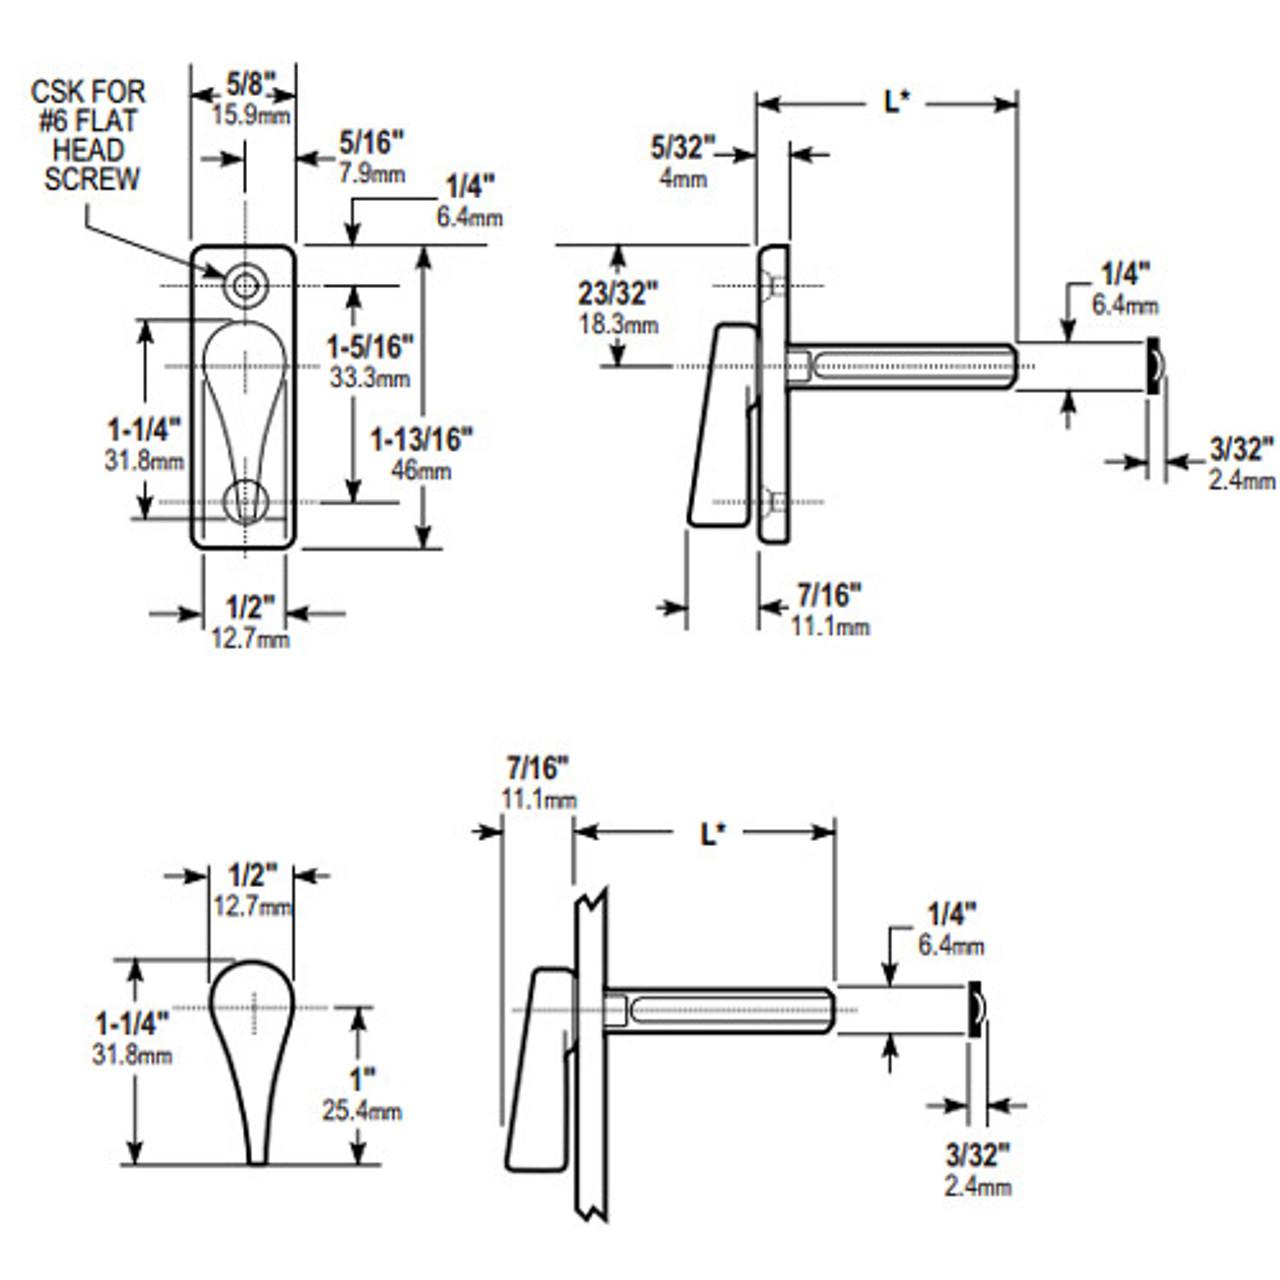 1000-02-11-119 Adams Rite 1000 Series Turns Dimensional View